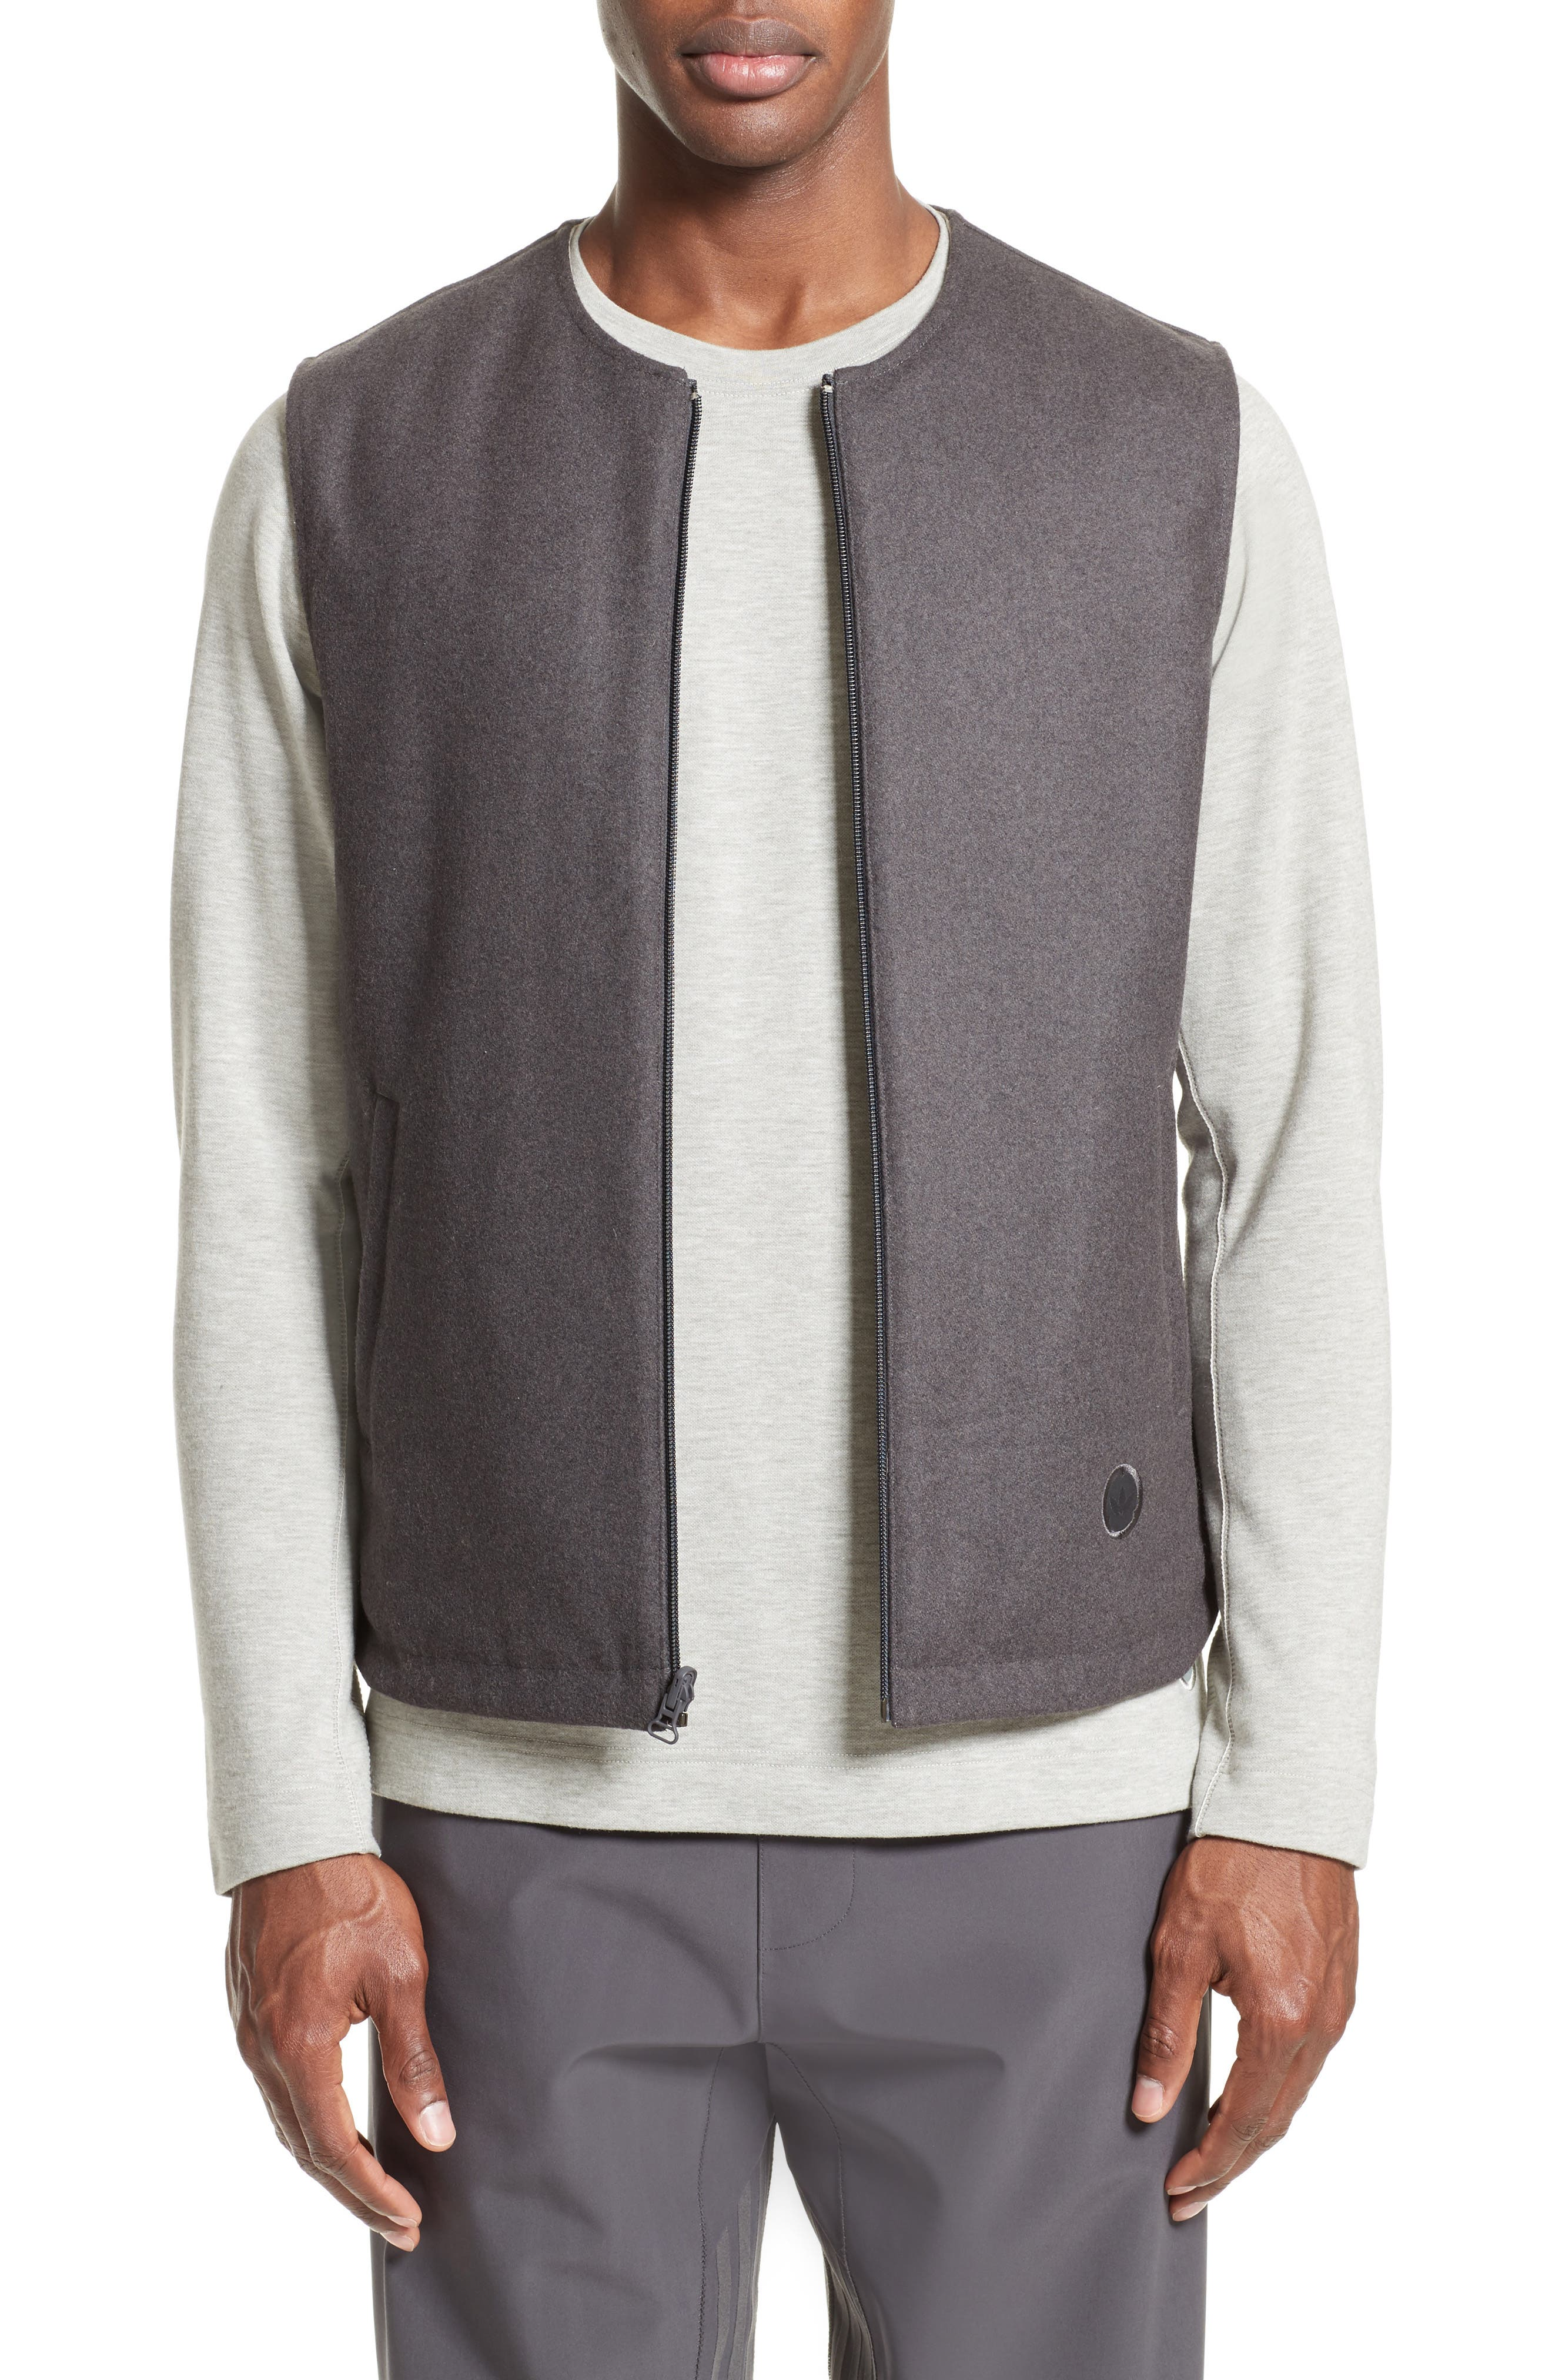 Alternate Image 1 Selected - wings + horns x adidas Reversible Vest